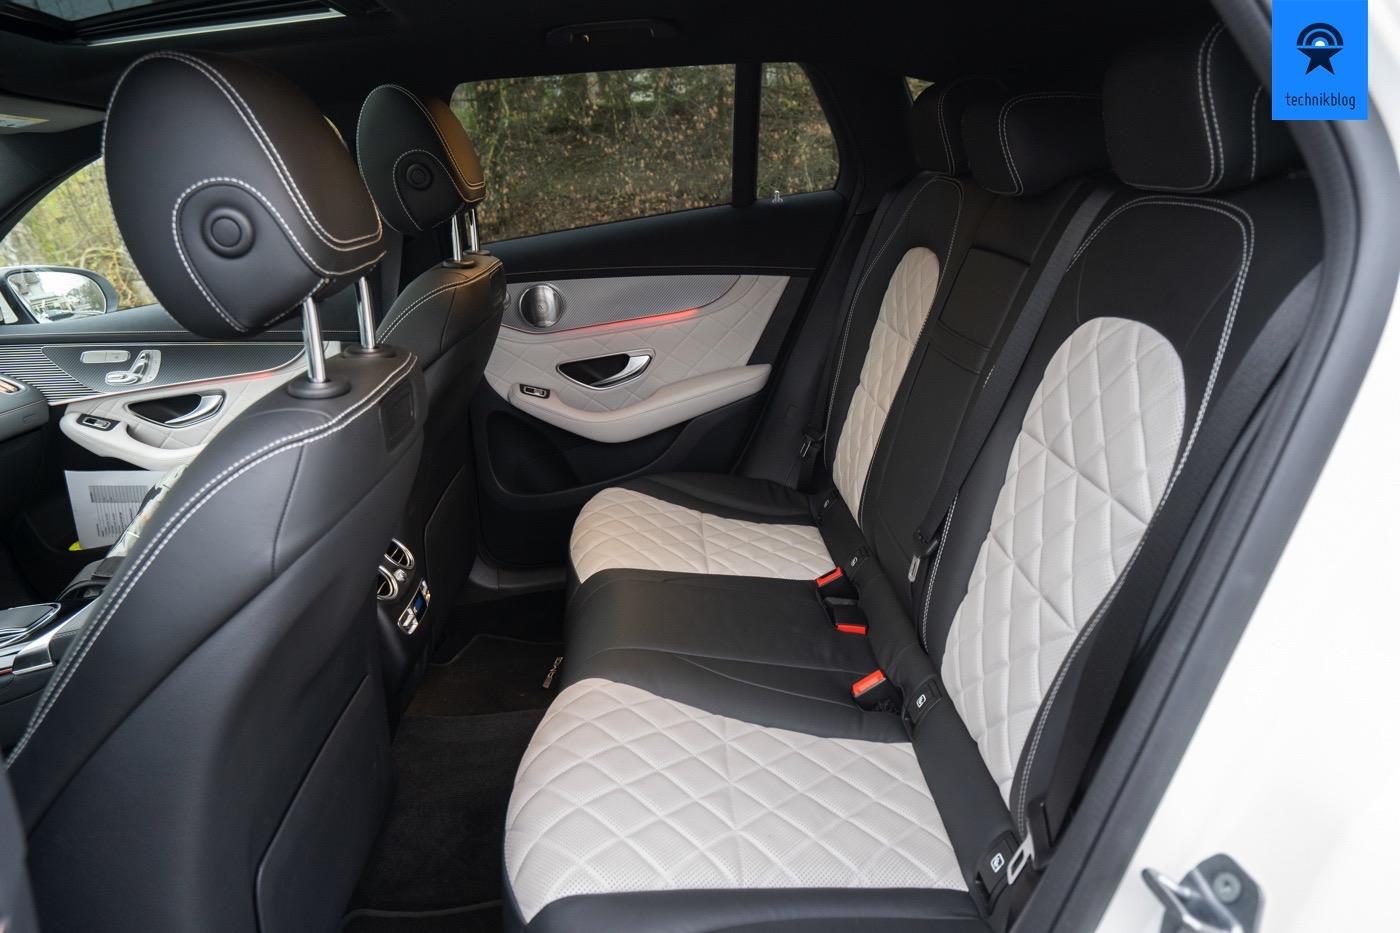 Hintere Sitzreihe des EQC 400